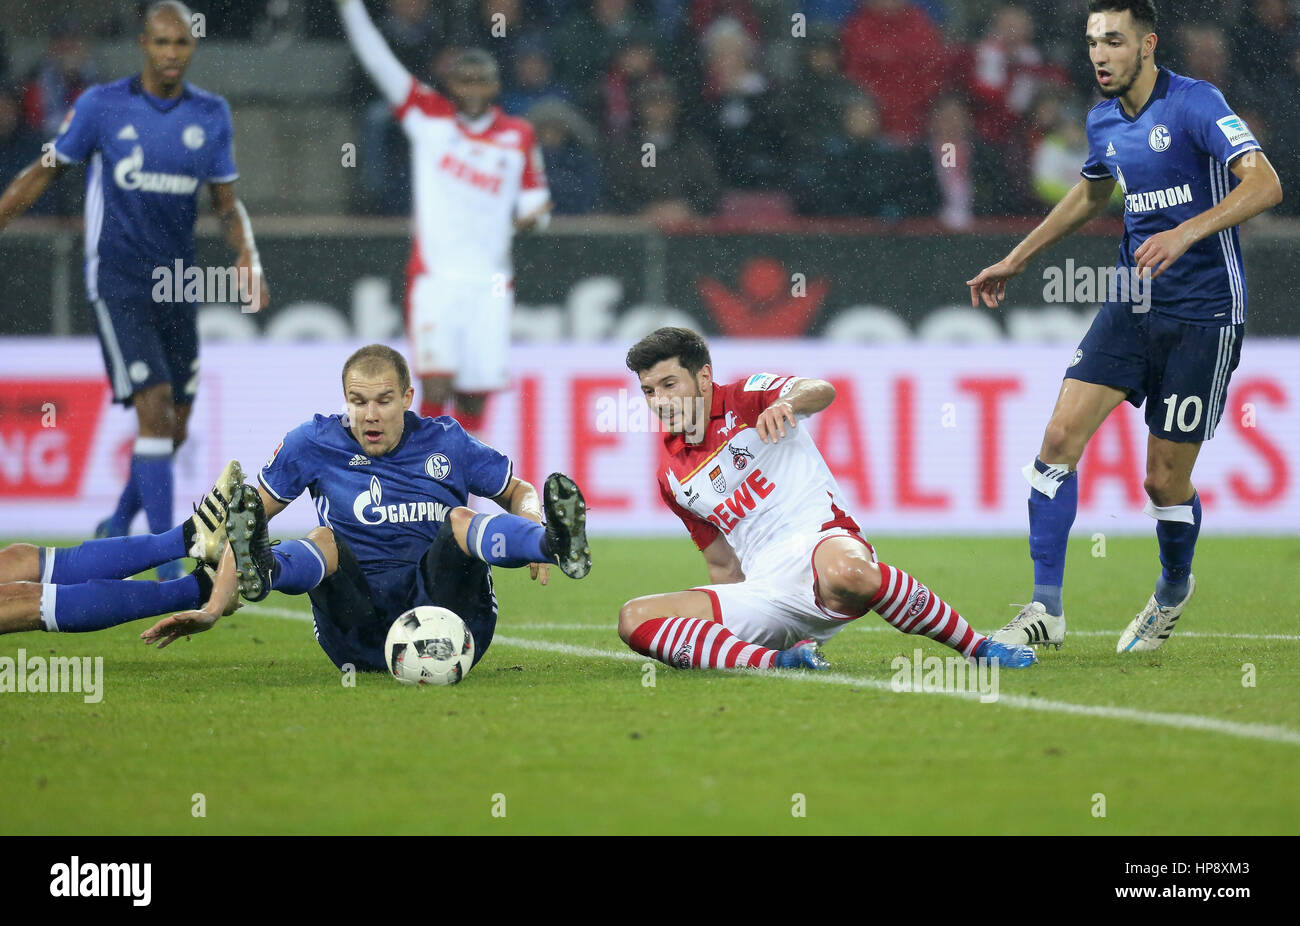 Cologne, Germany, February 19, 2017, Bundesliga matchday 21, 1. FC Koeln - FC Schalke 04:  Tackling Milos Jojic - Stock Image